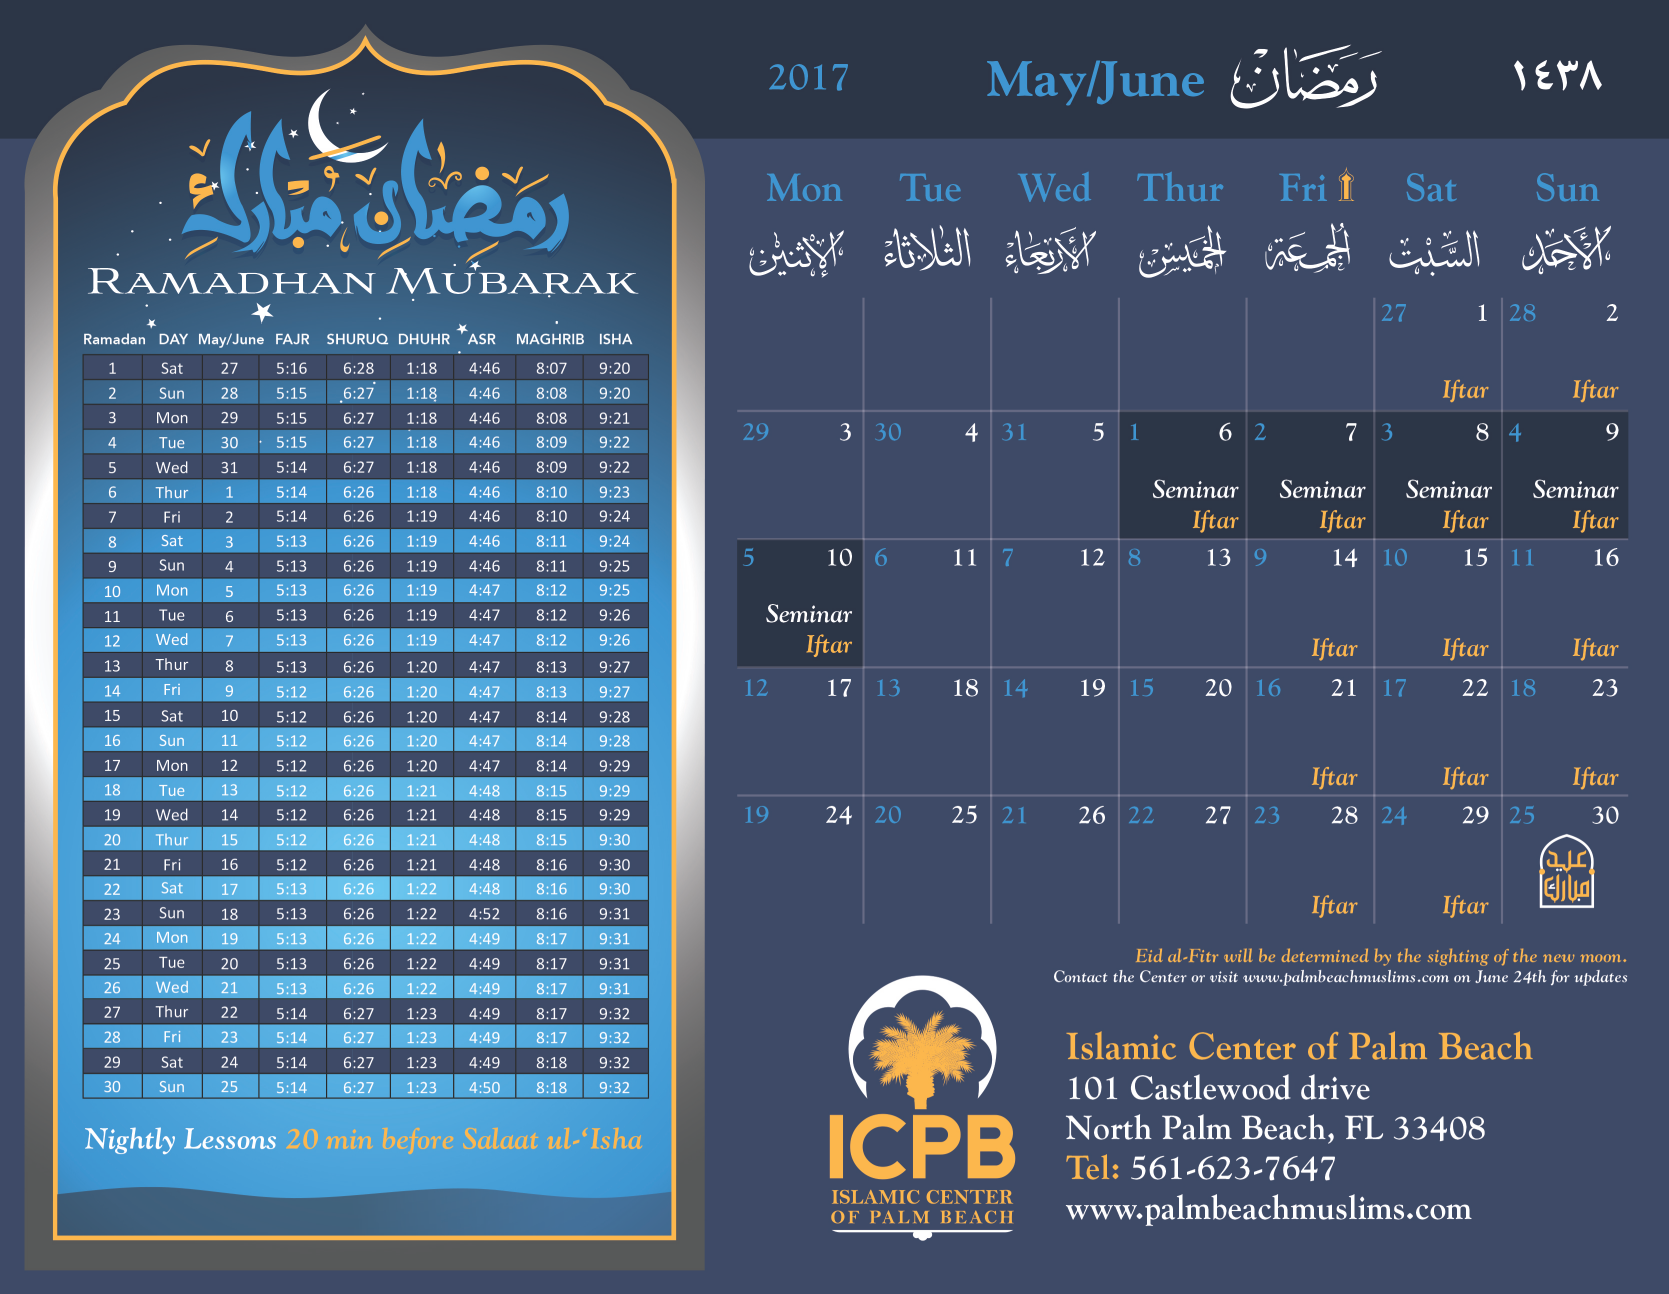 Ramadan 1438/2017 Prayer Times Calendar (North Palm Beach, FL